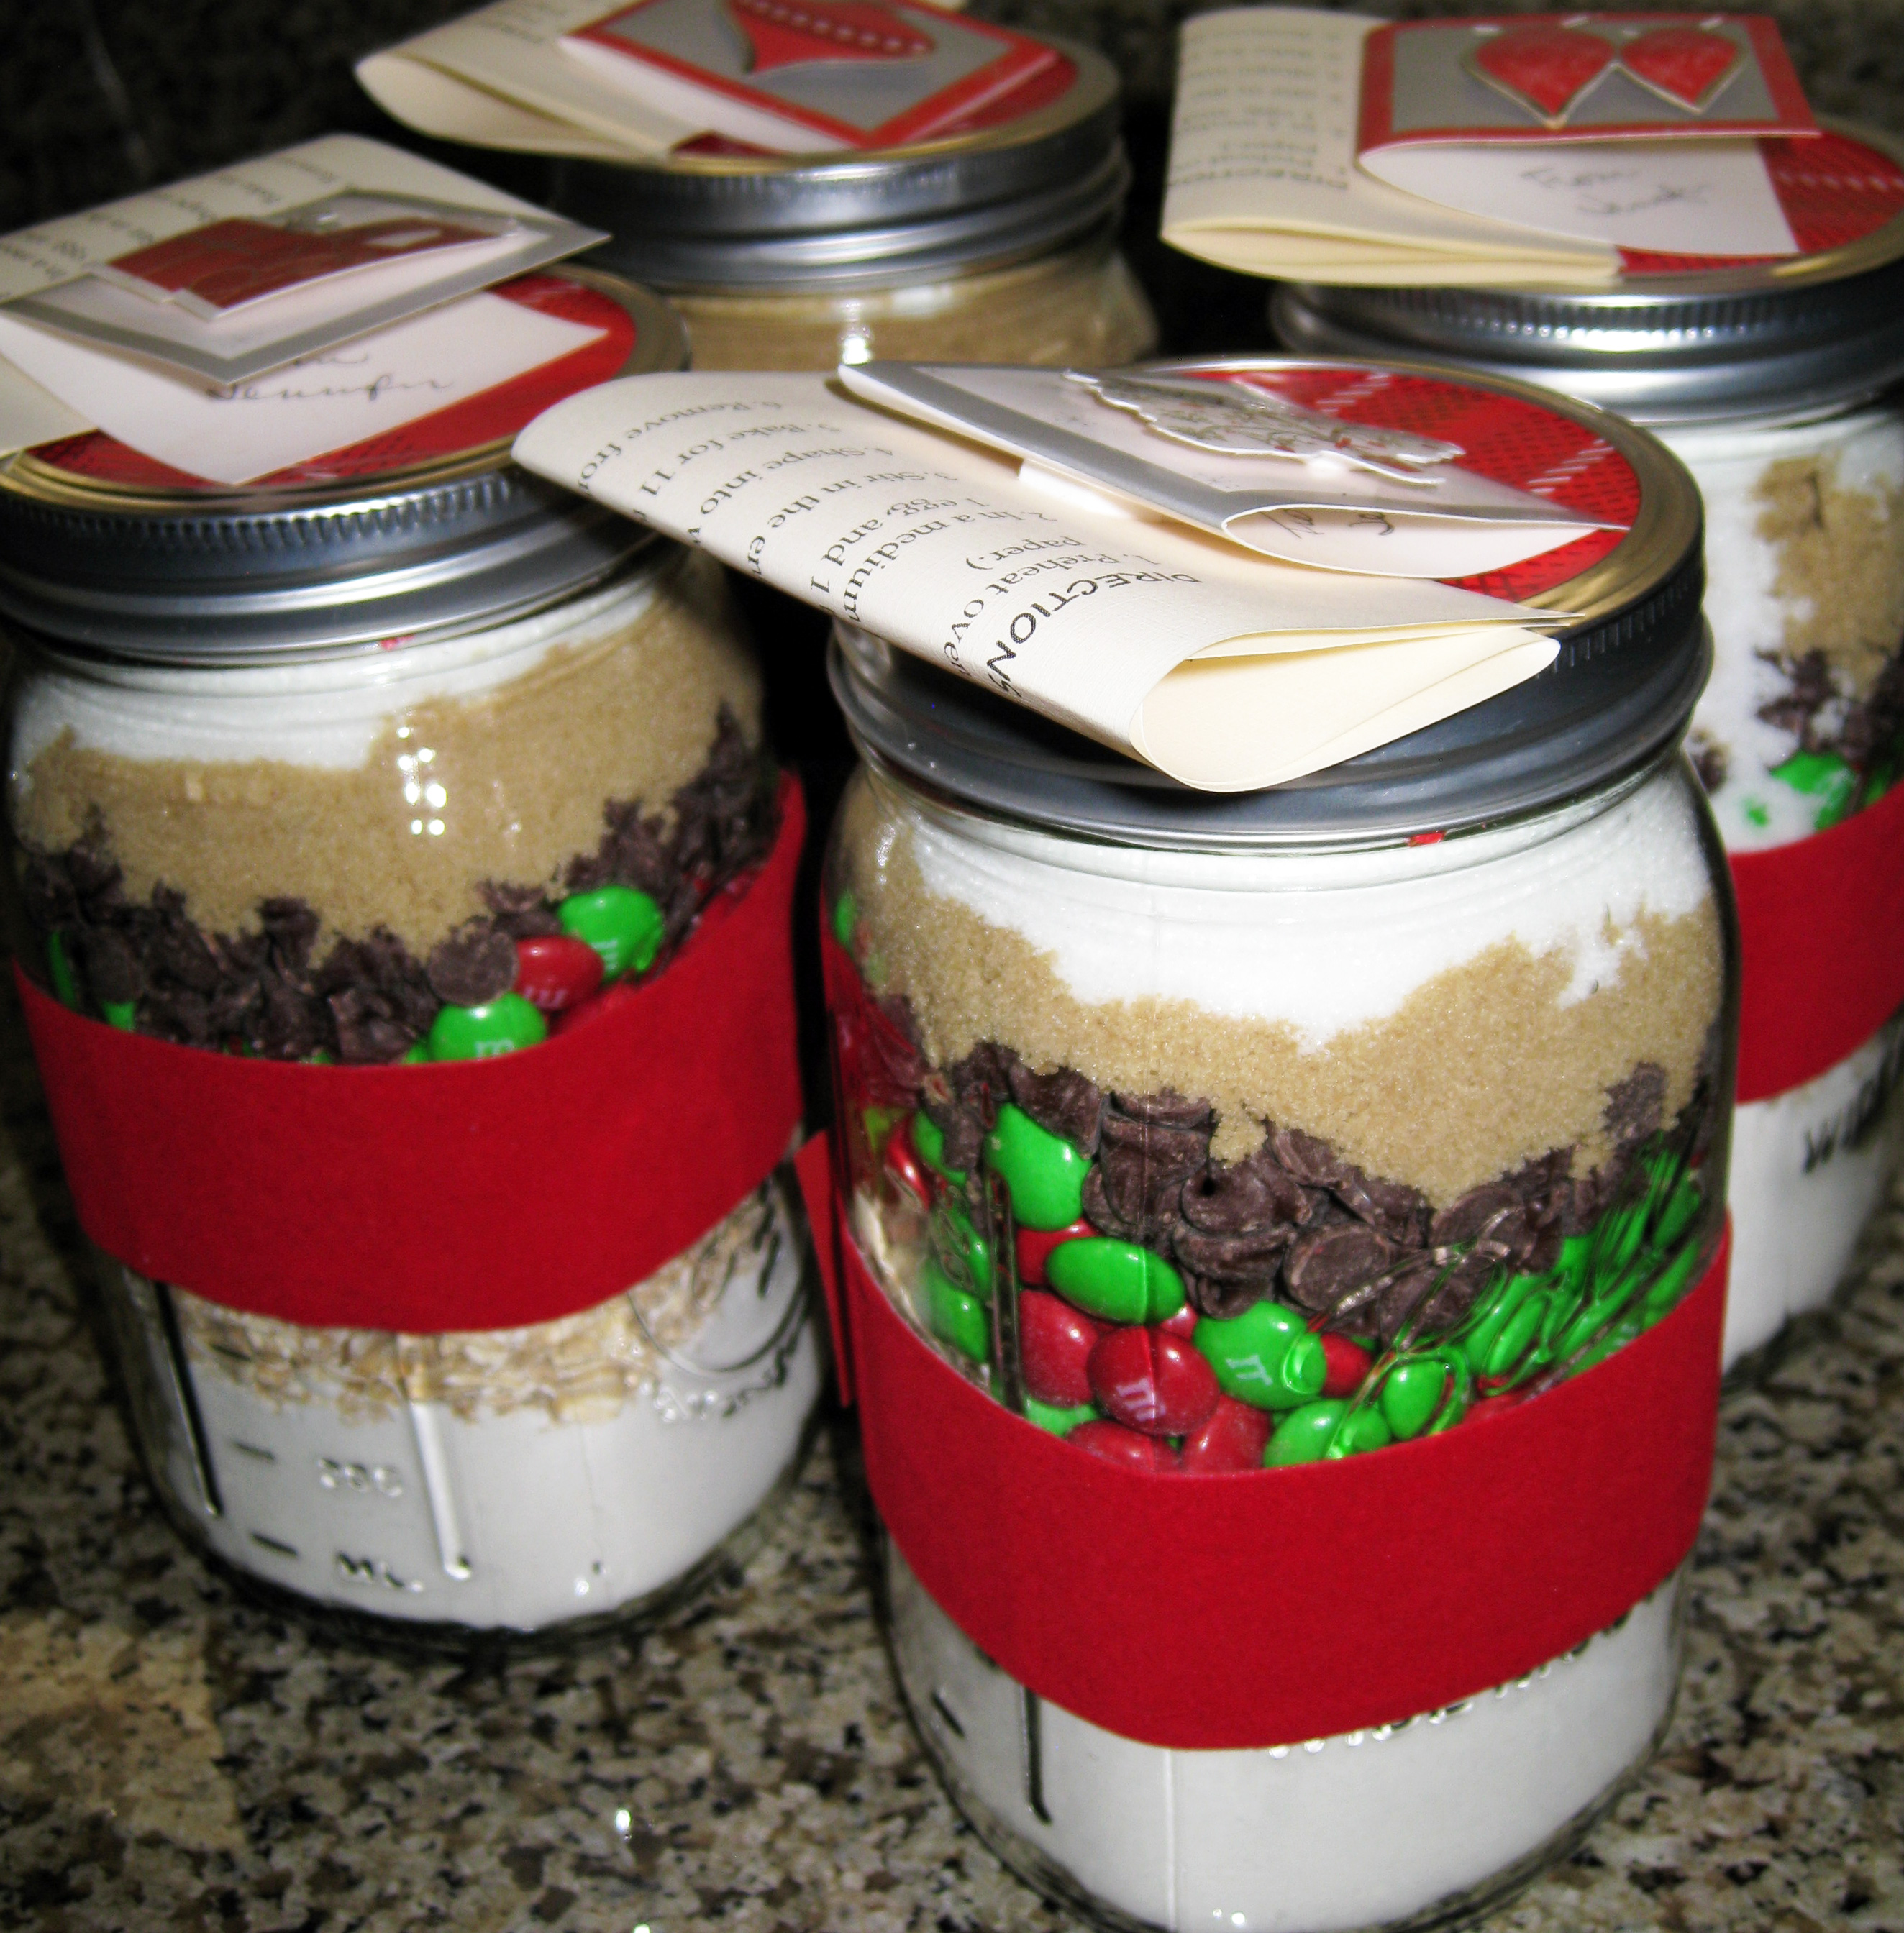 Homemade Gift Jars and Cookies